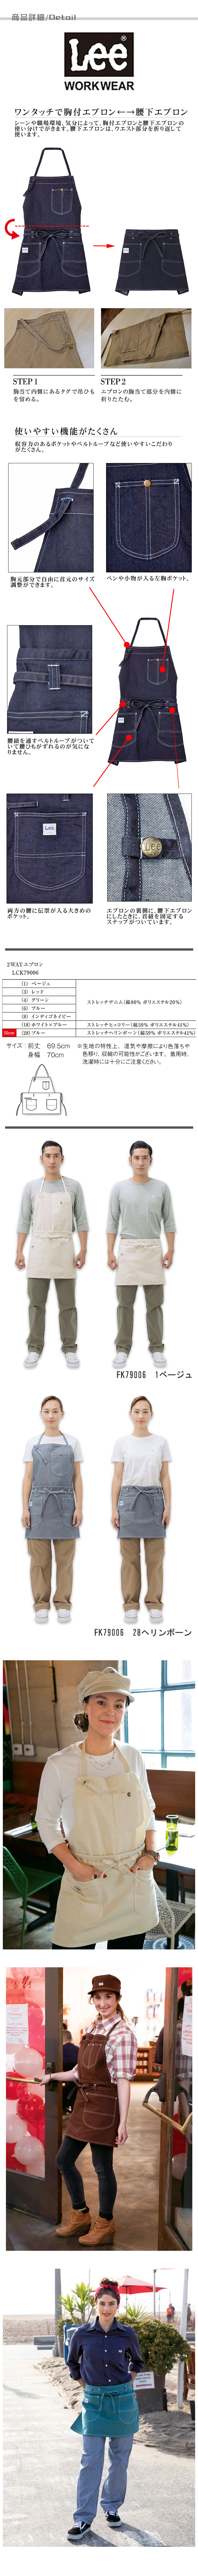 Lee workwear胸付でも腰下でも使える2WAYエプロン 7色【男女兼用】 機能詳細説明